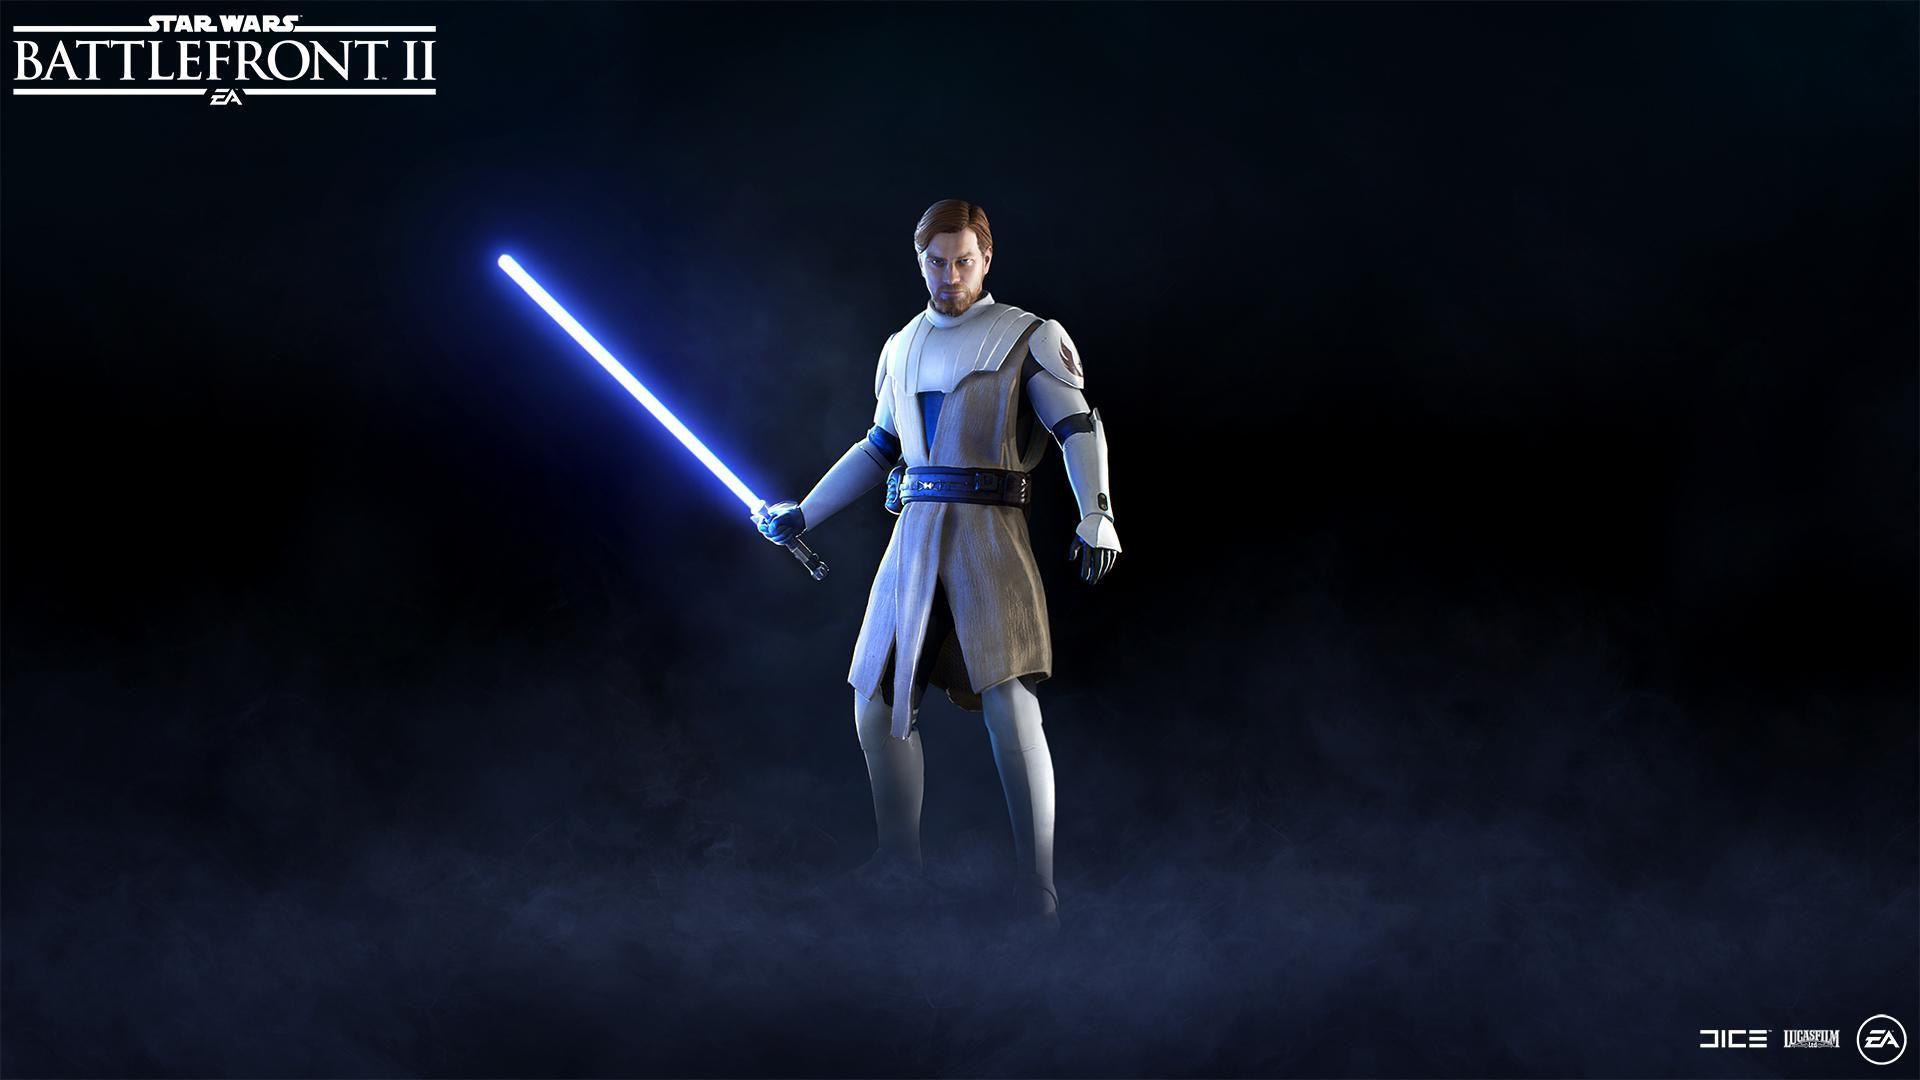 Star Wars Battlefront 2 Update 1.23 Fixes Obi Wan and Bugs